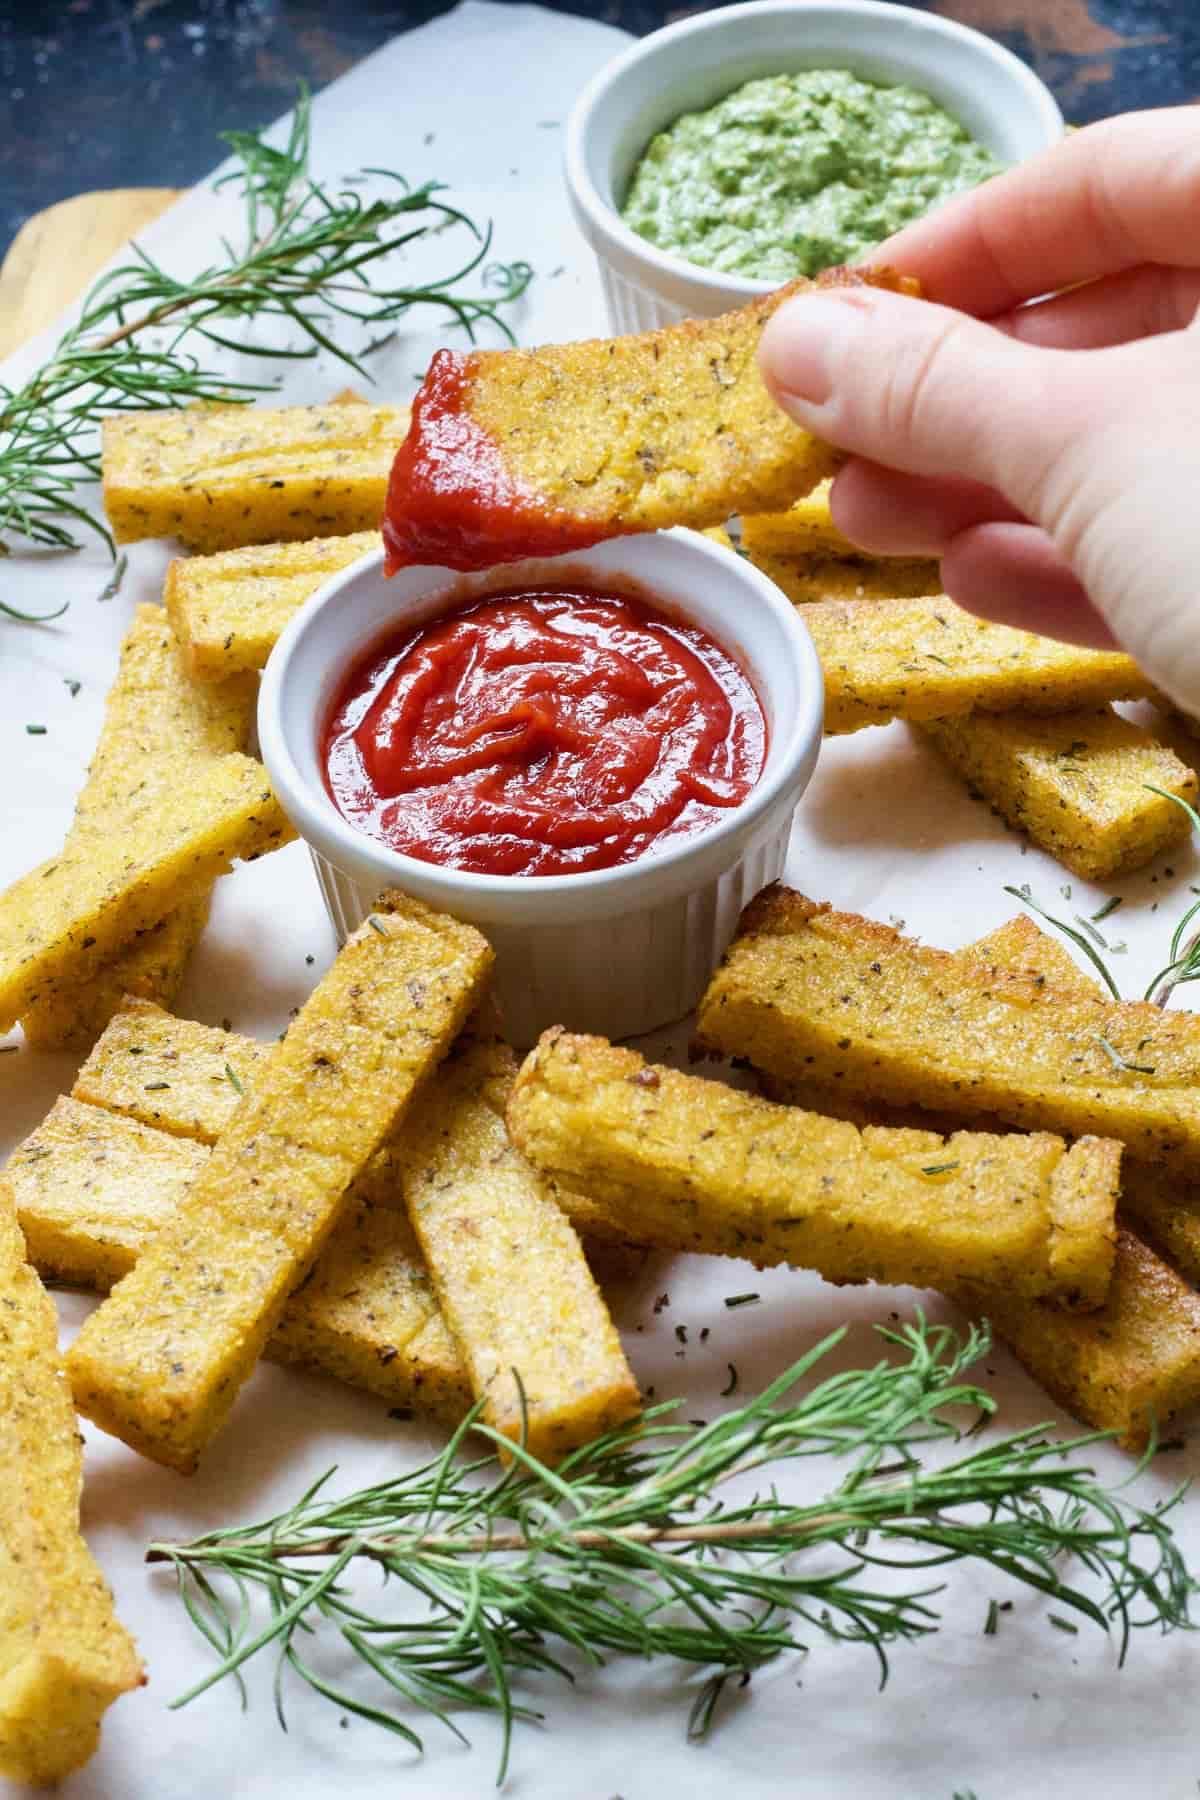 Hand dipping polenta chip in ketchup.